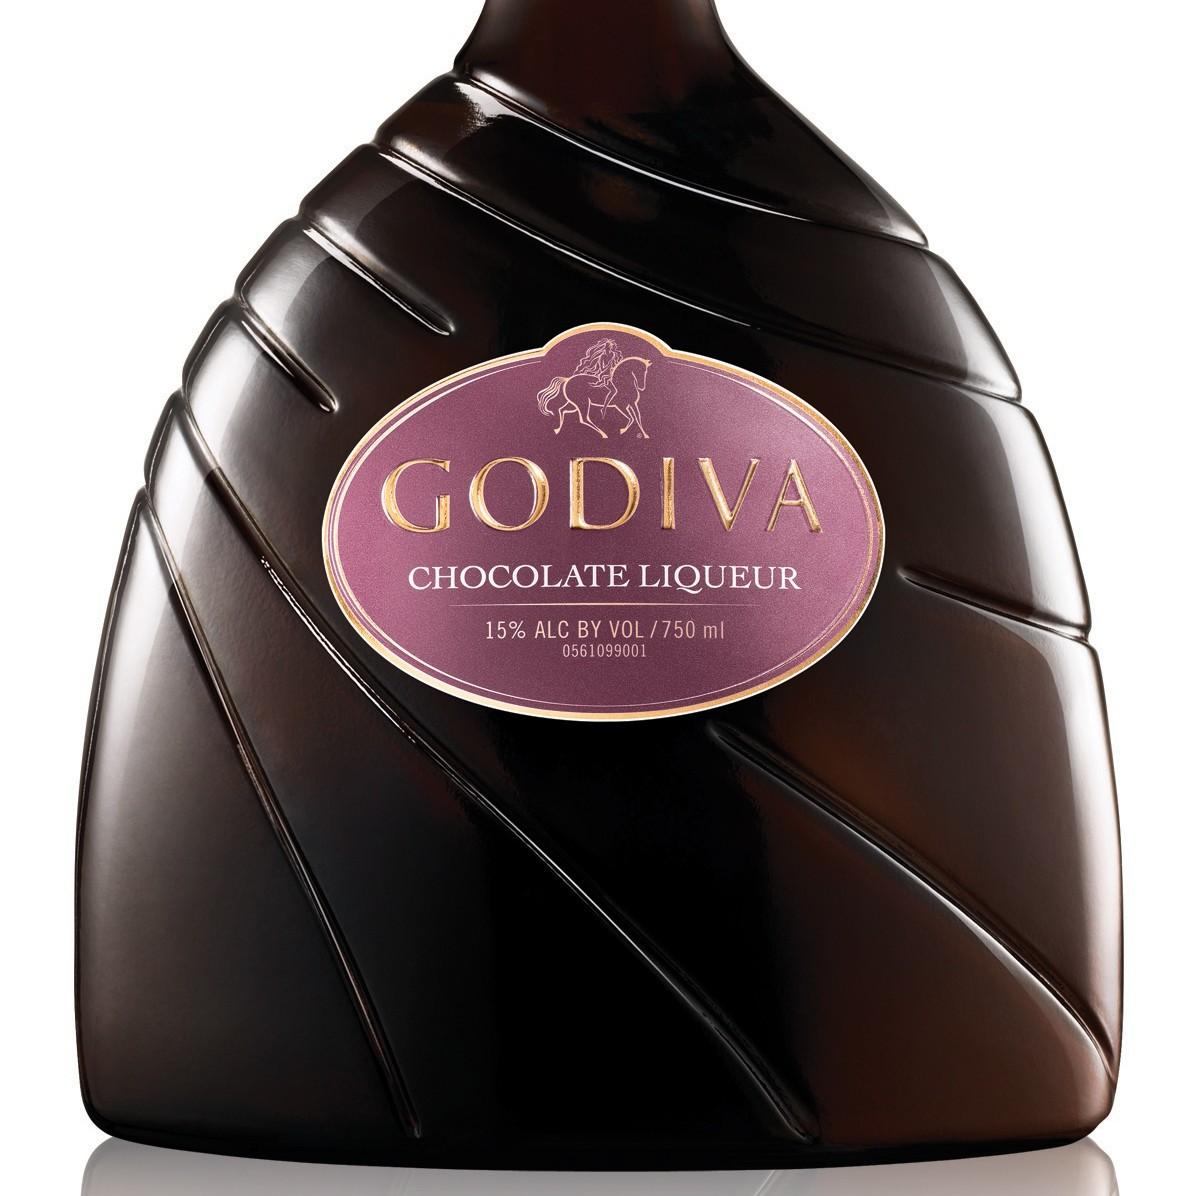 Godiva Chocolate Liqueur Delivery | GRG Wines